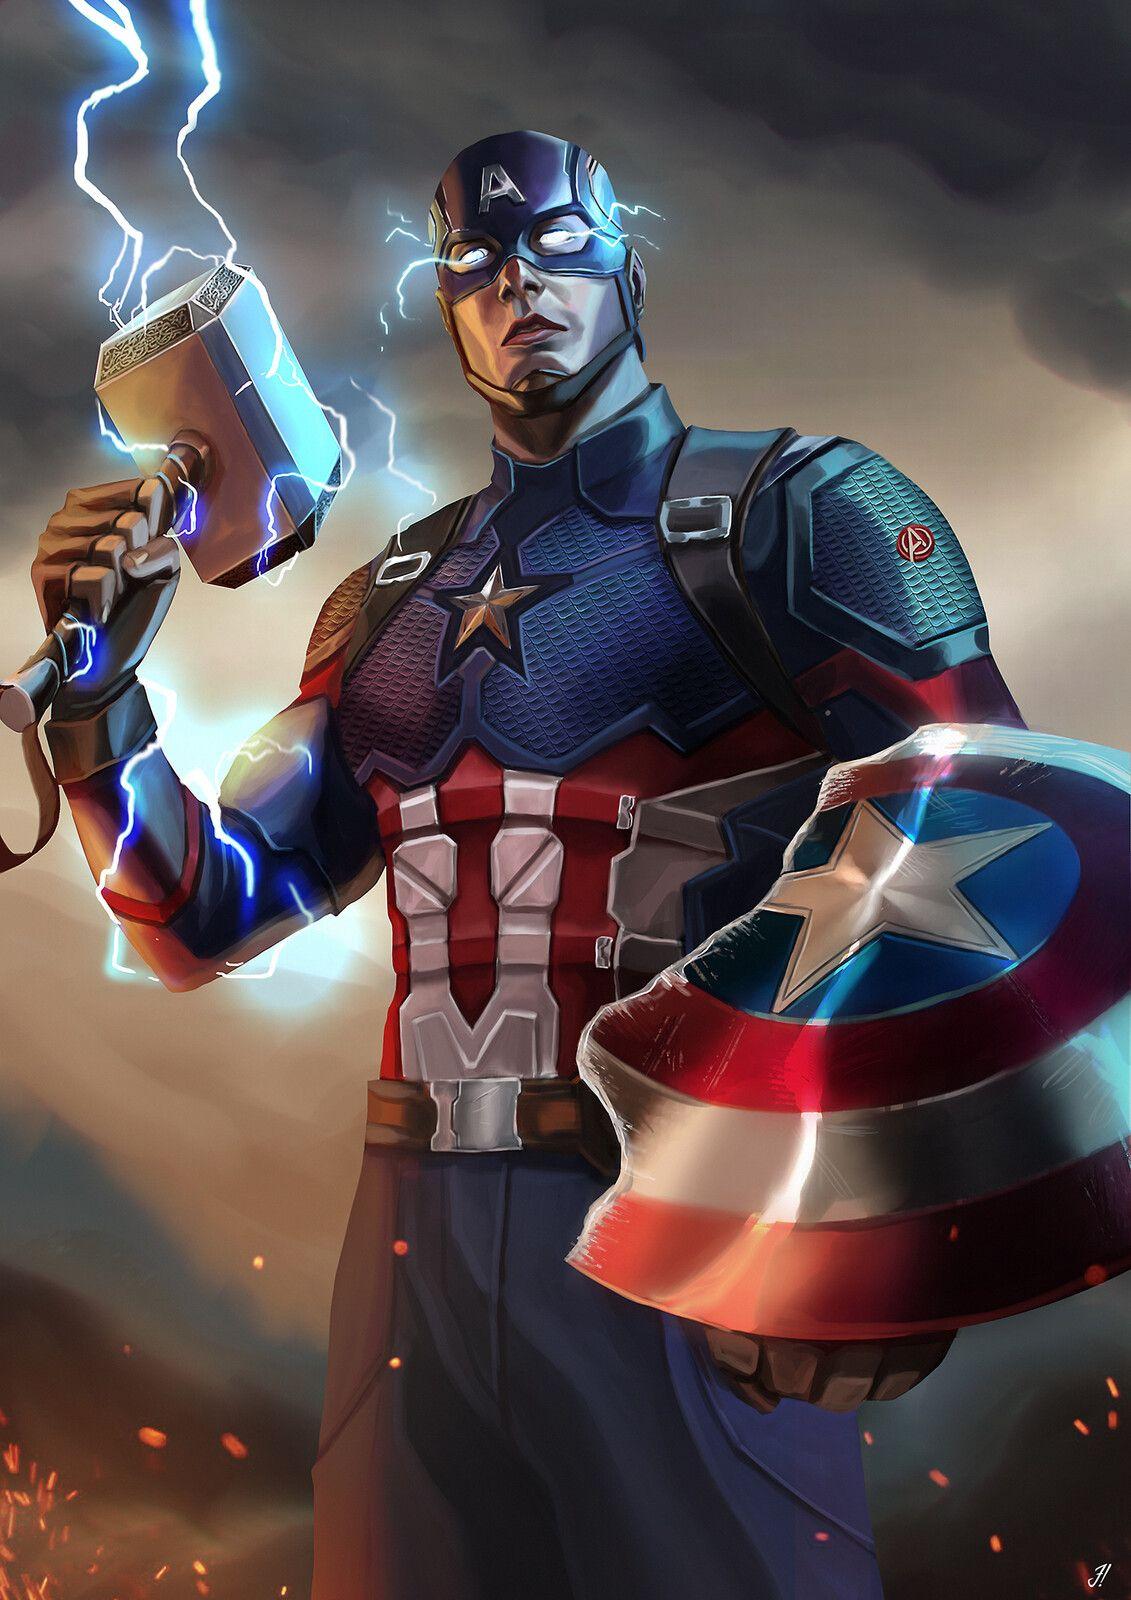 Guess what Thor? I am always Worthy. #AvengersEndgame.